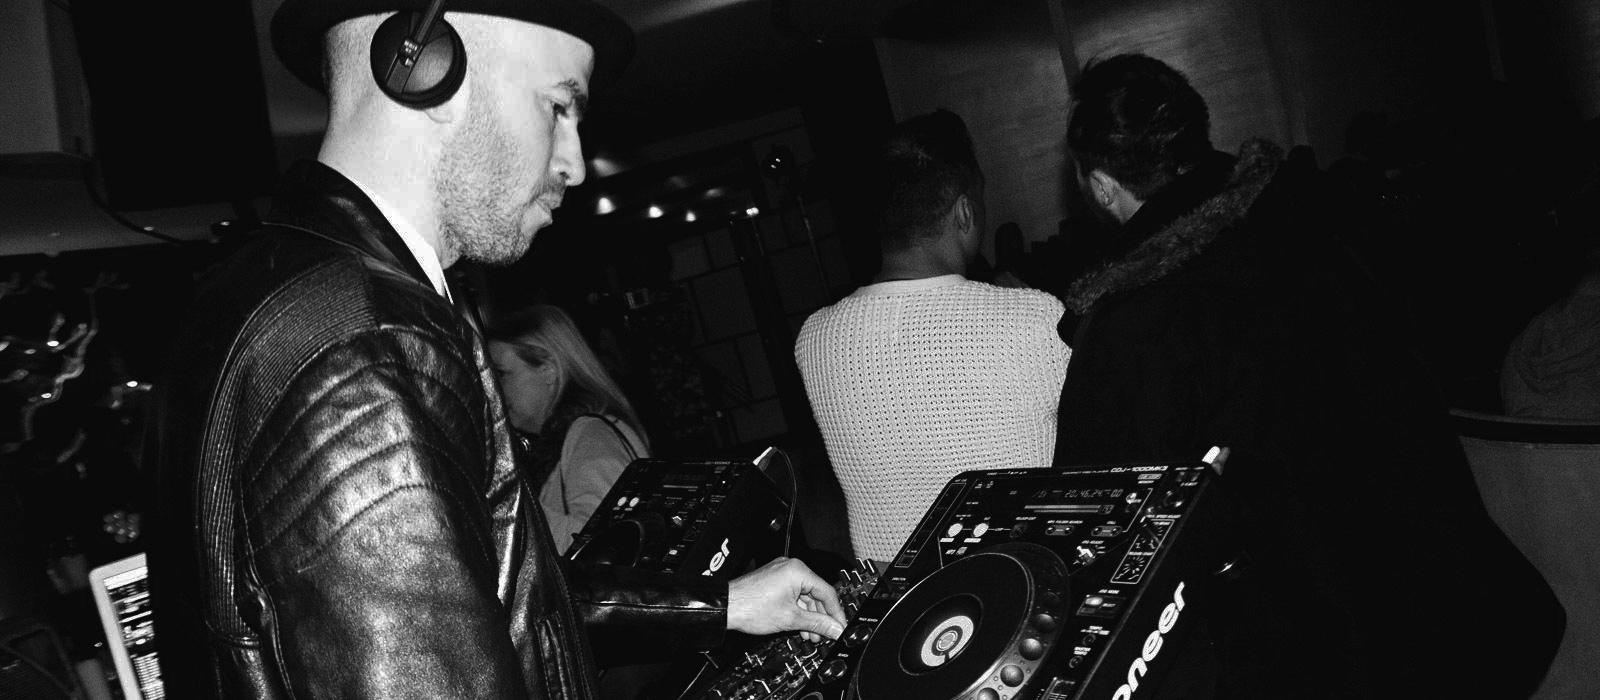 DJ and Musician Sourcing